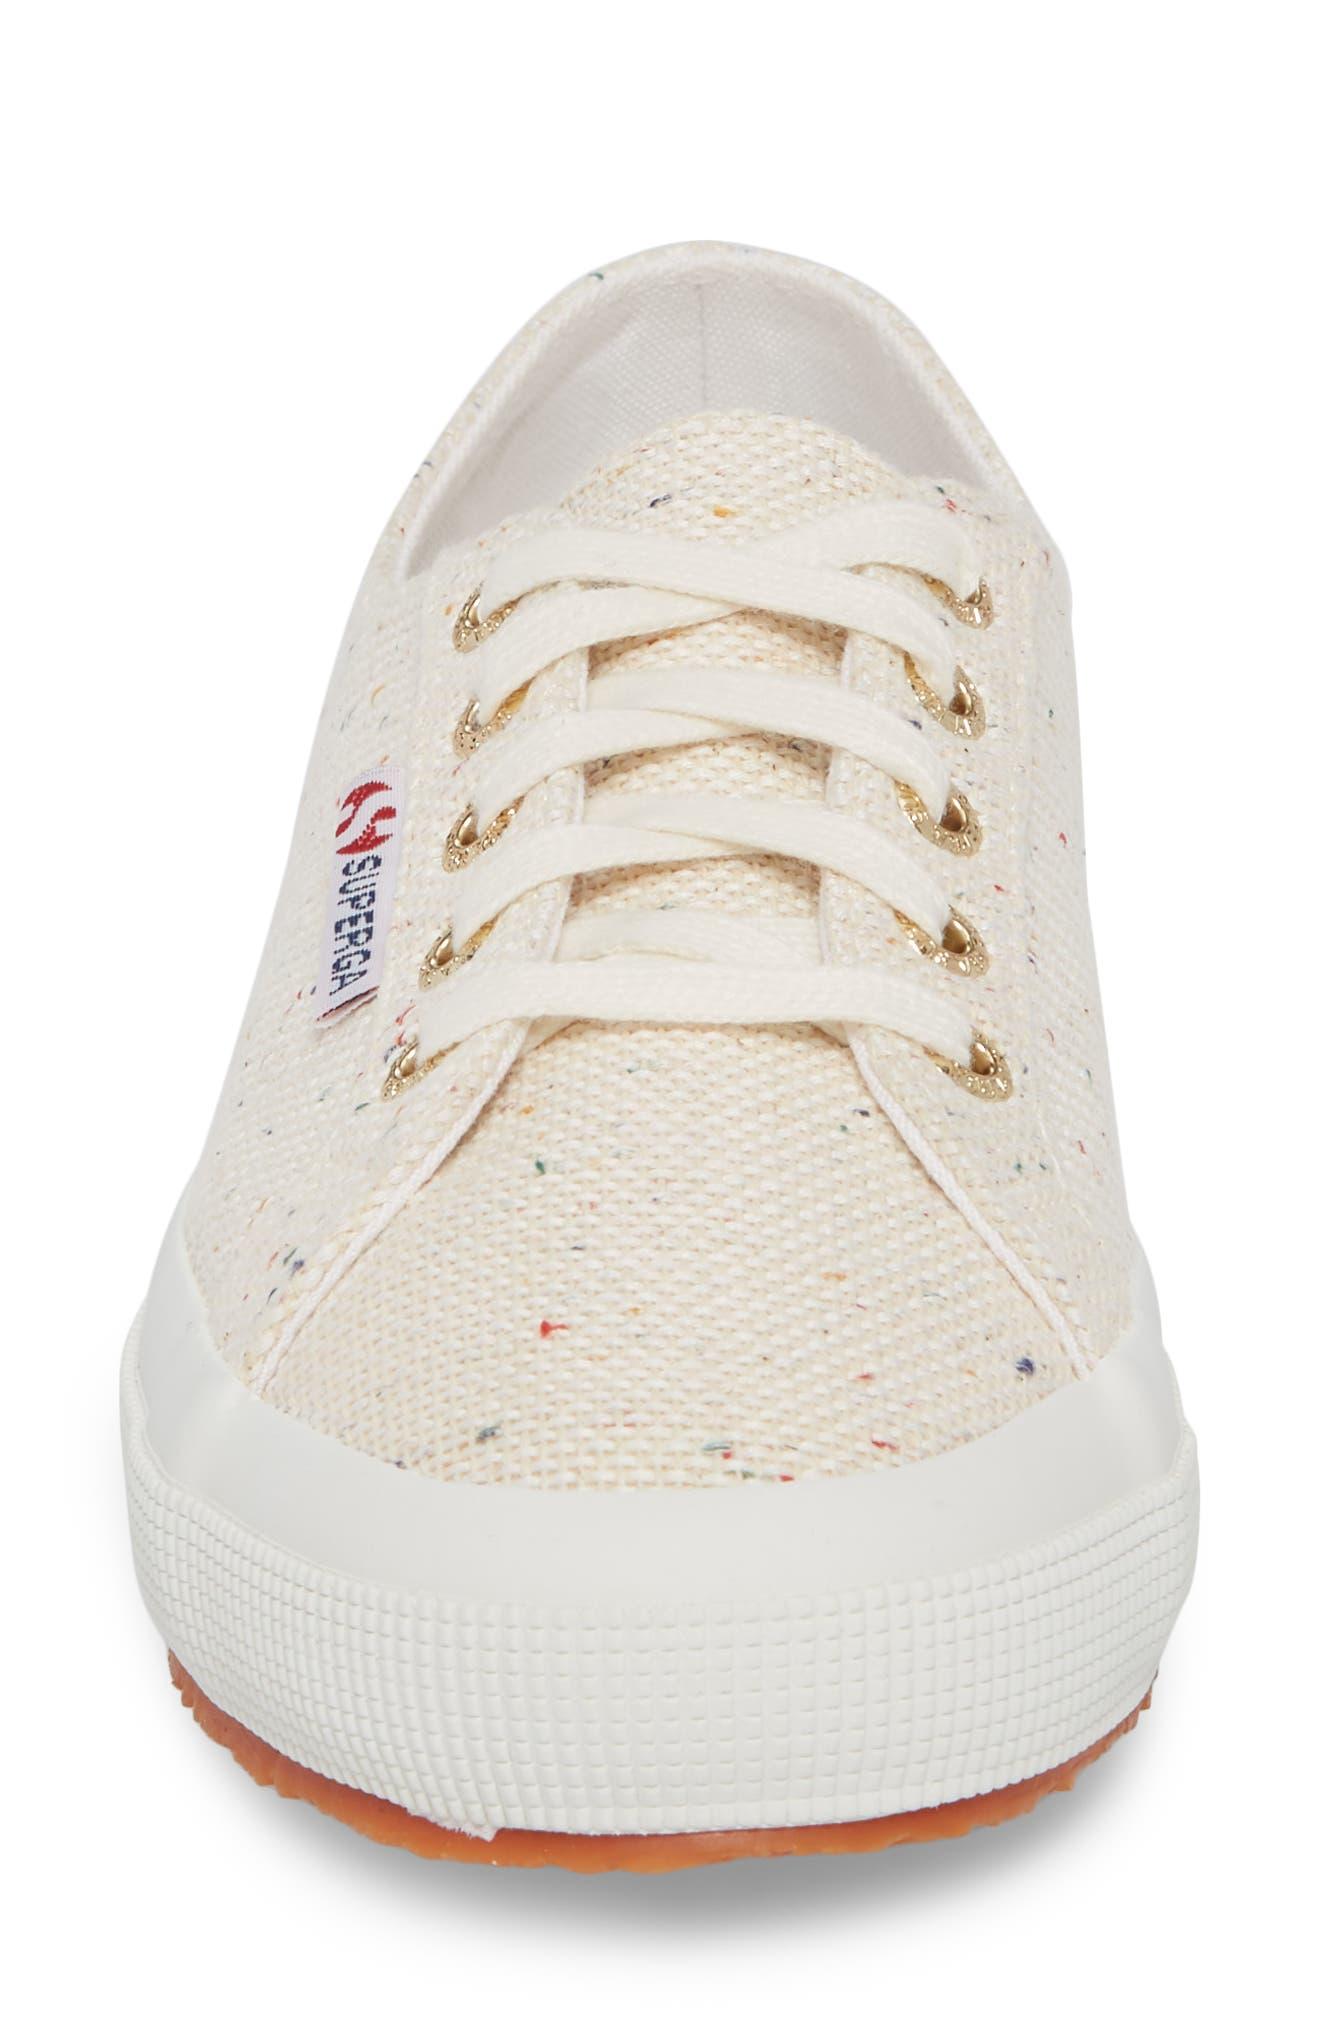 2750 Speckle Low Top Sneaker,                             Alternate thumbnail 4, color,                             White Multi